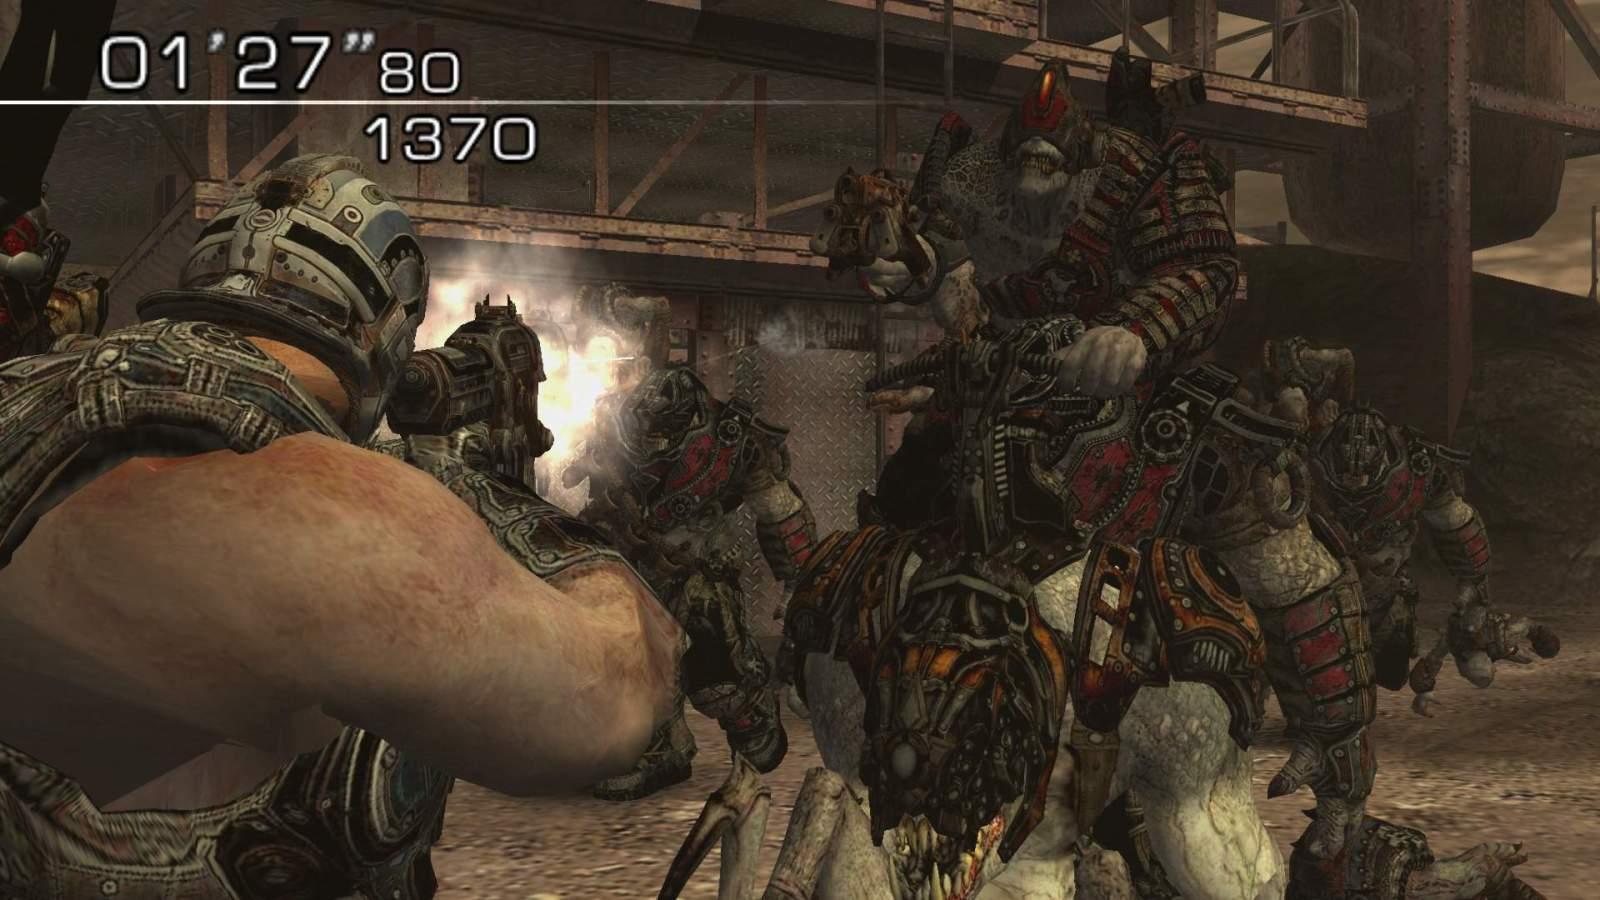 """Gears of Evil"" V.1.0 - Gears of War - MegaPack Xbfx8y"